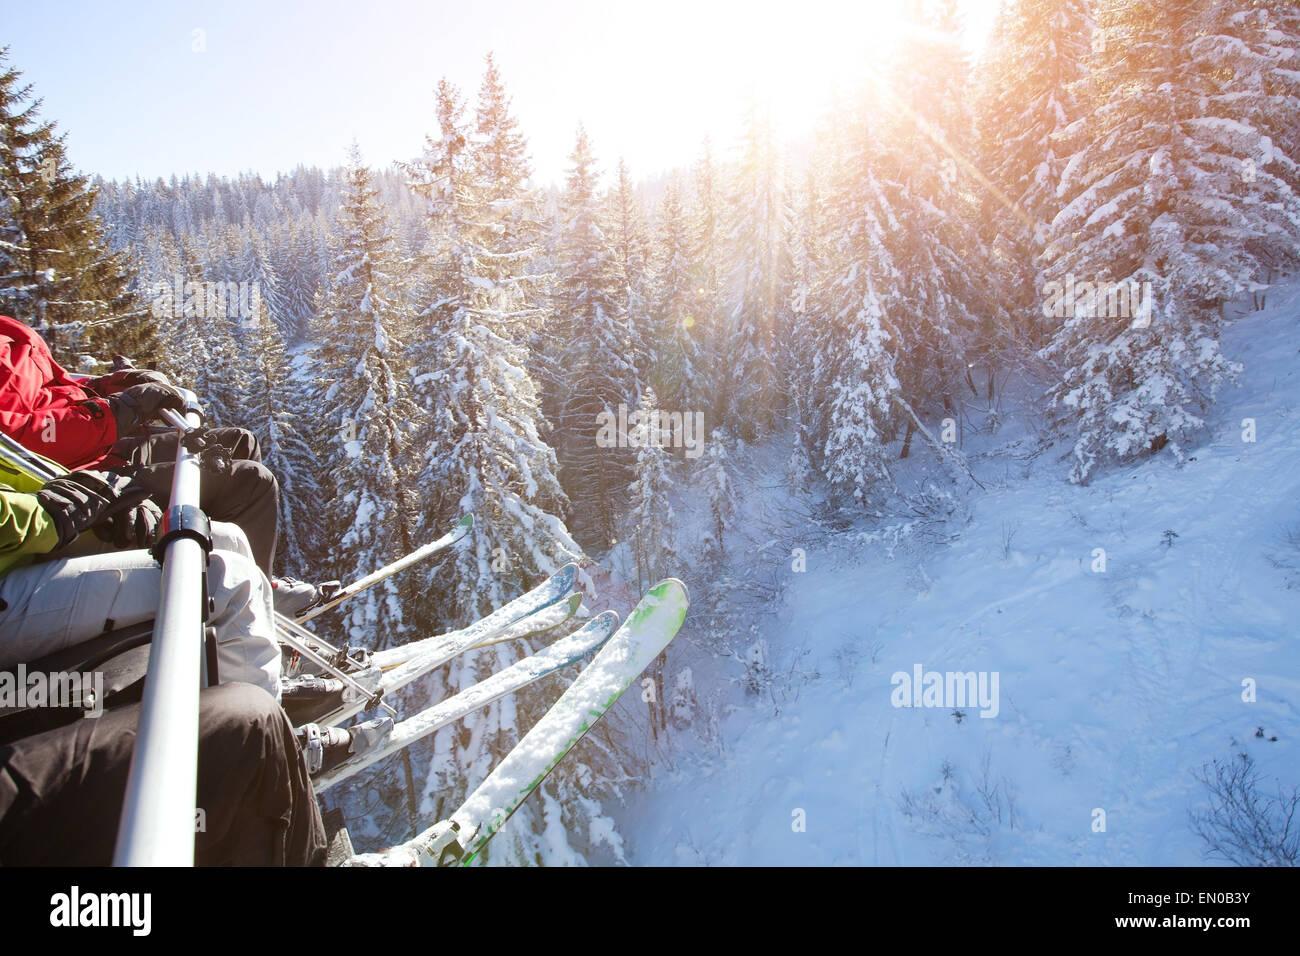 Familia sentada en ski lift Imagen De Stock